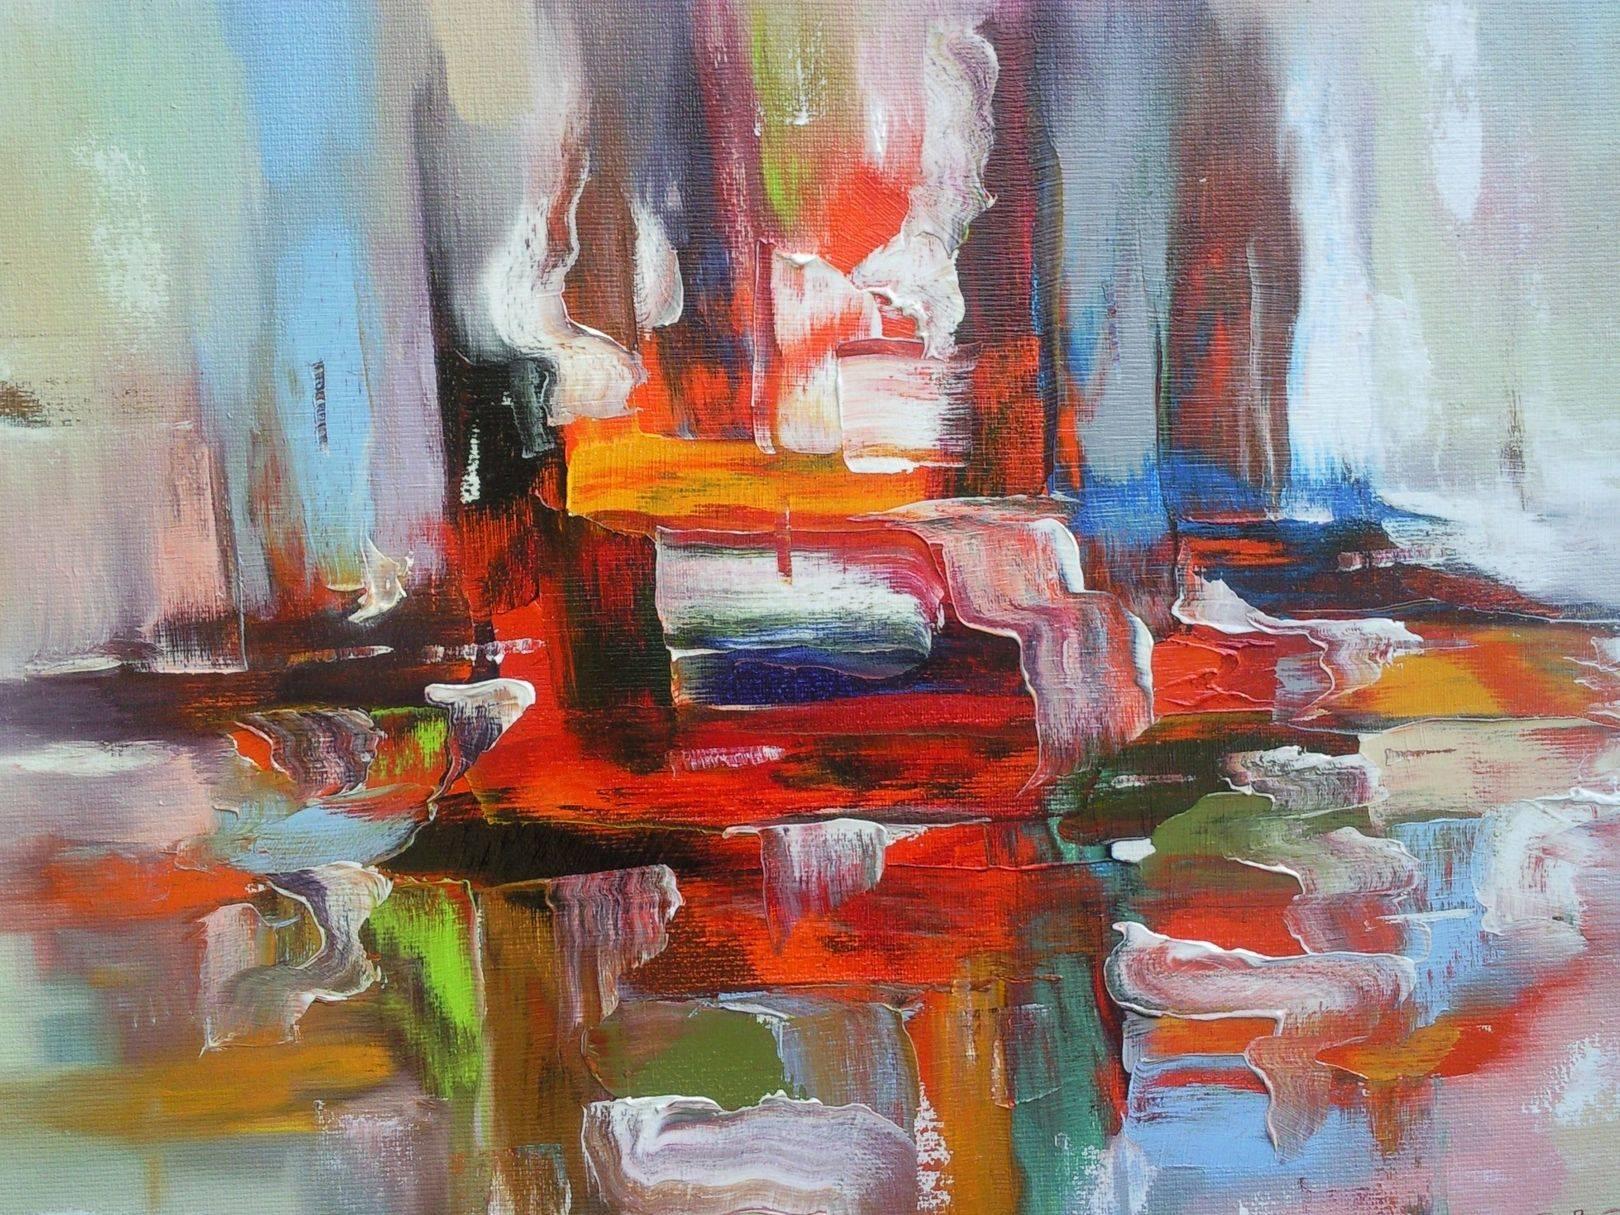 «Корабли в порту»      холст, масло «The ships in port»       oil on canvas  50x70,  2012